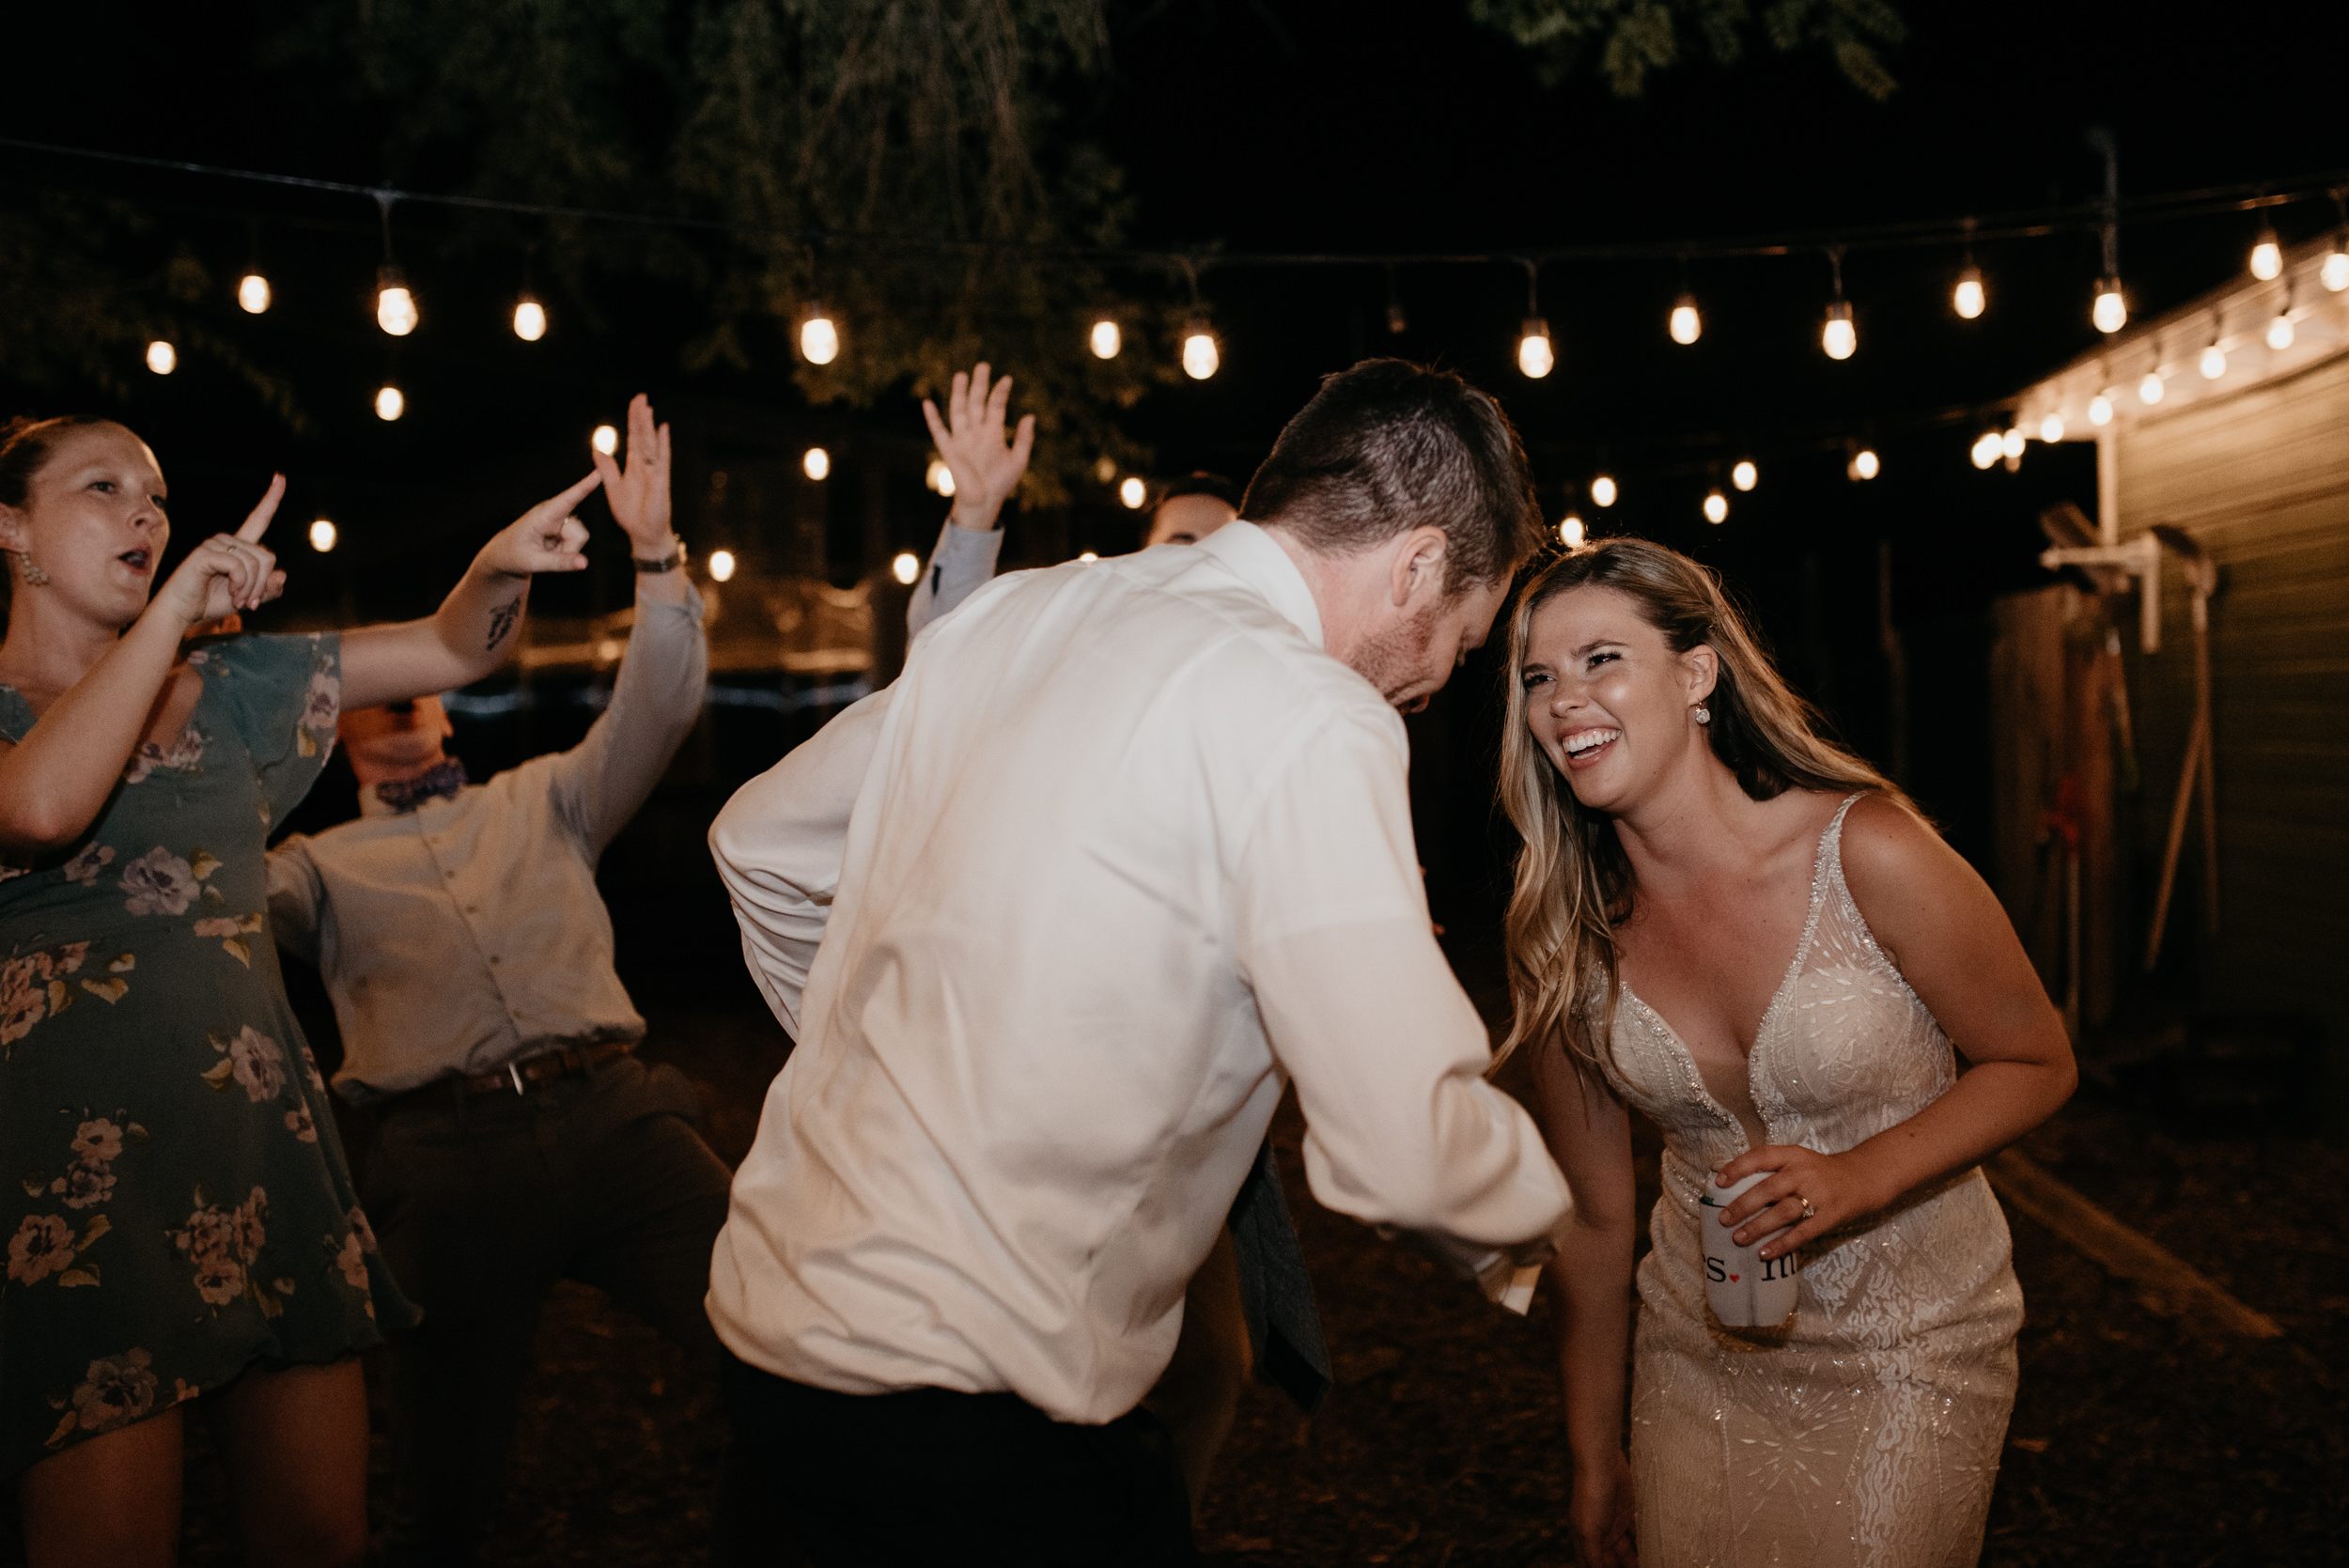 Bride and groom dancing at Boulder, Colorado wedding reception. Boulder wedding and elopement photographer.